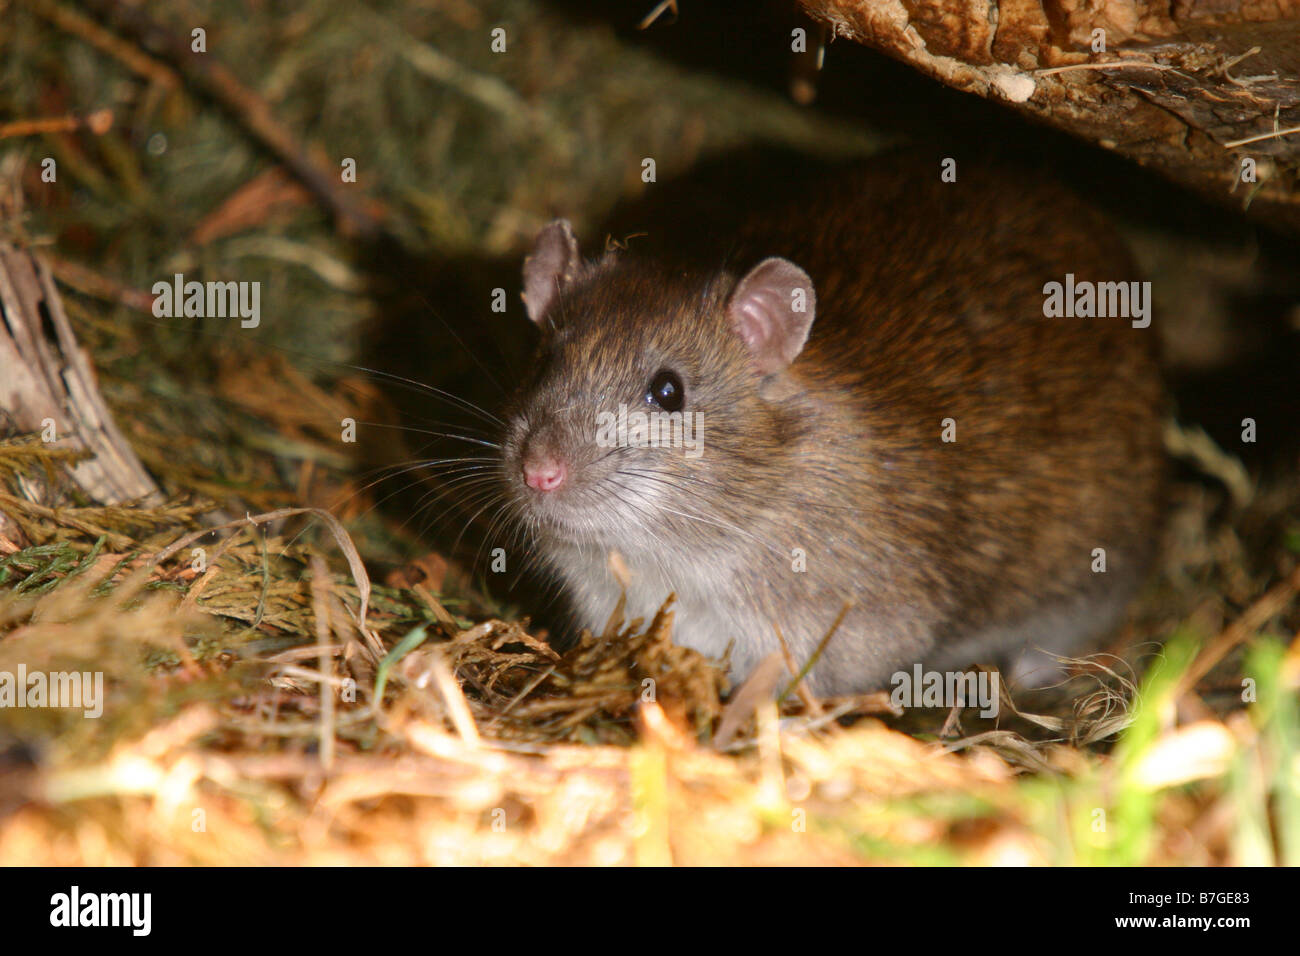 brown common rat rattus norvegicus hiding under wood pile in domestic garden - Stock Image